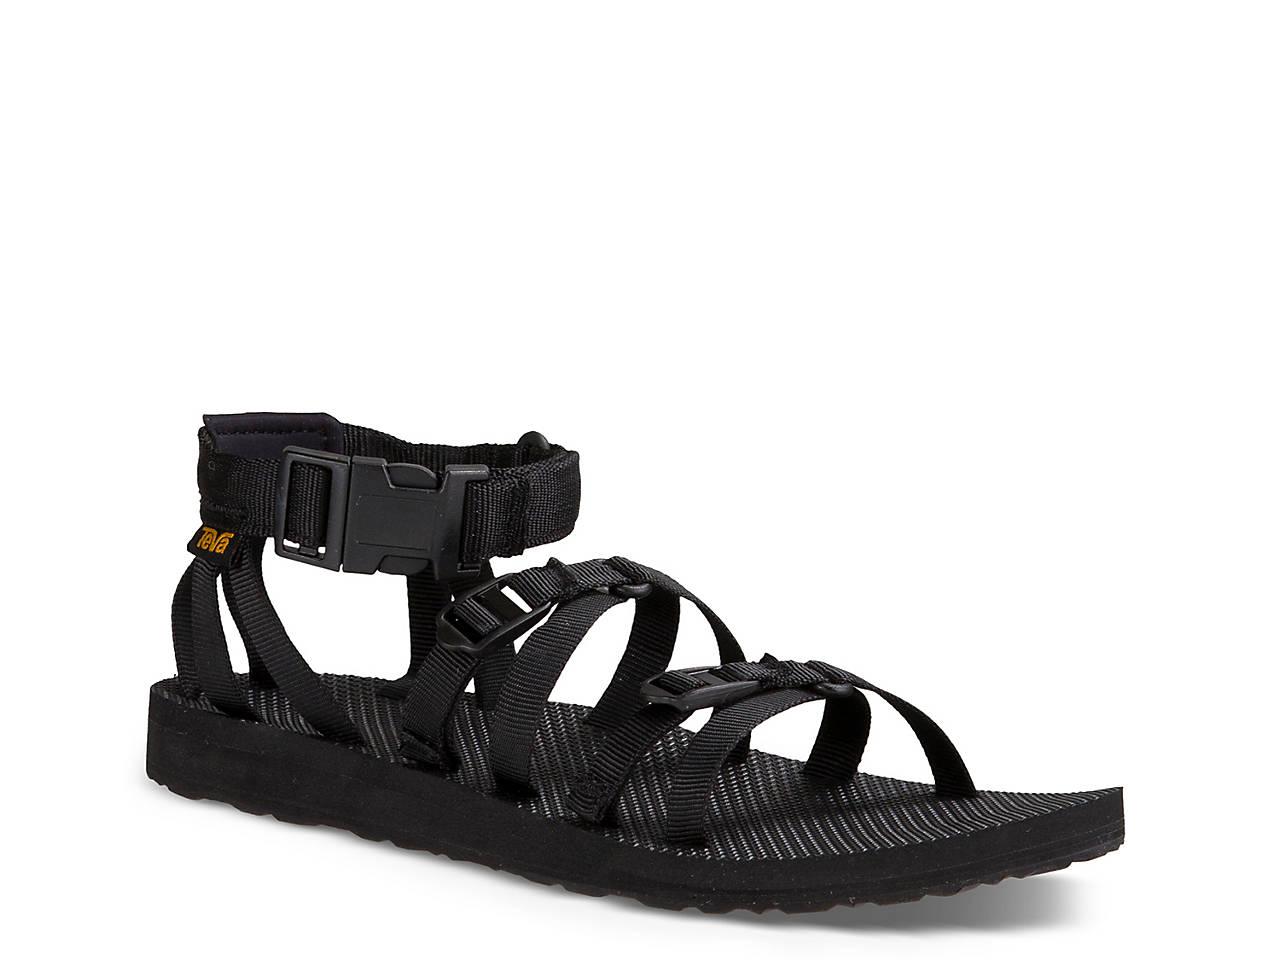 c1d82b6b2 Teva Alp Sport Sandal Women s Shoes